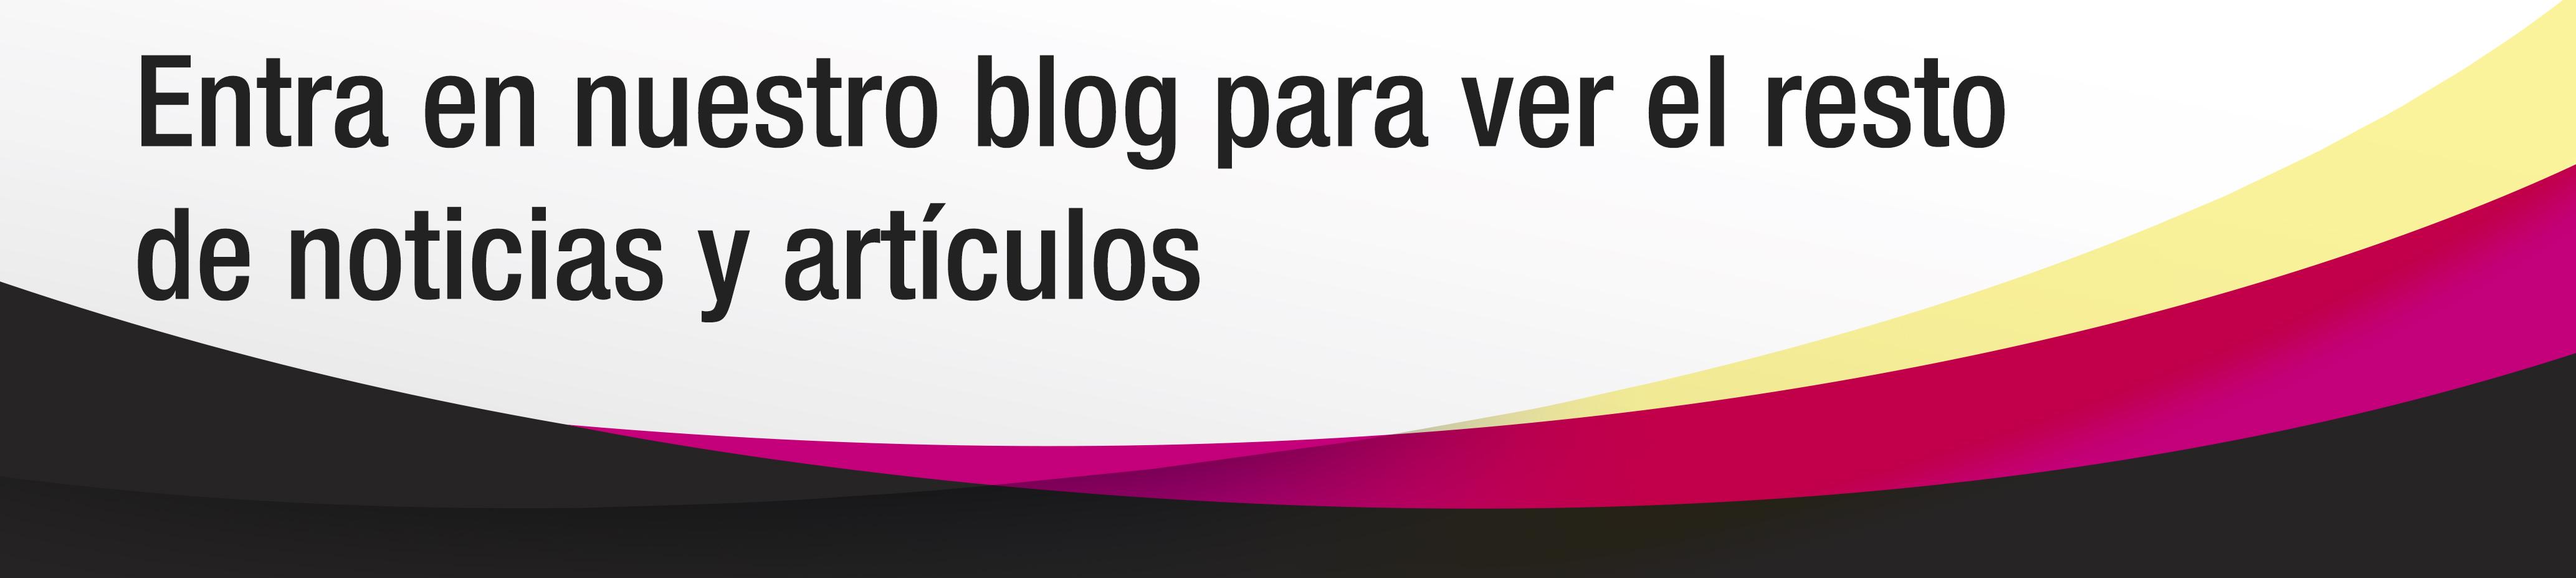 Banner que direcciona al blog de Sherpa Print